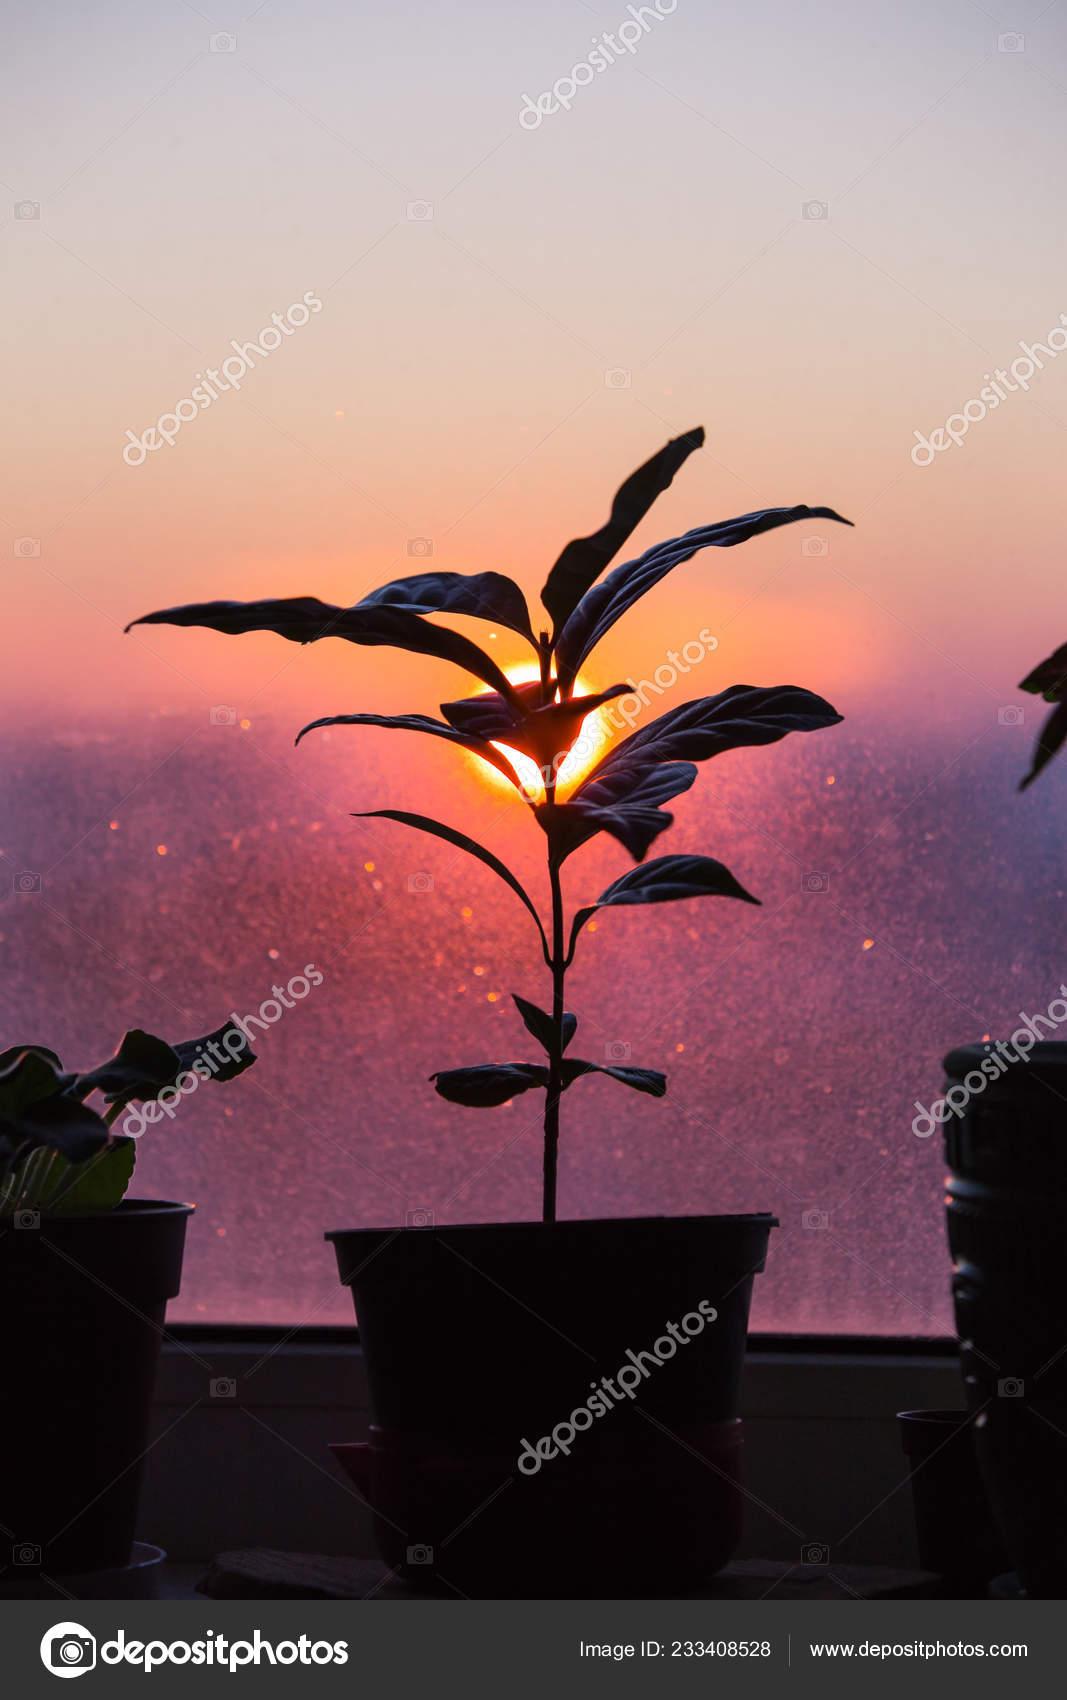 https://st4.depositphotos.com/14740706/23340/i/1600/depositphotos_233408528-stock-photo-coffee-plant-pot-stands-window.jpg